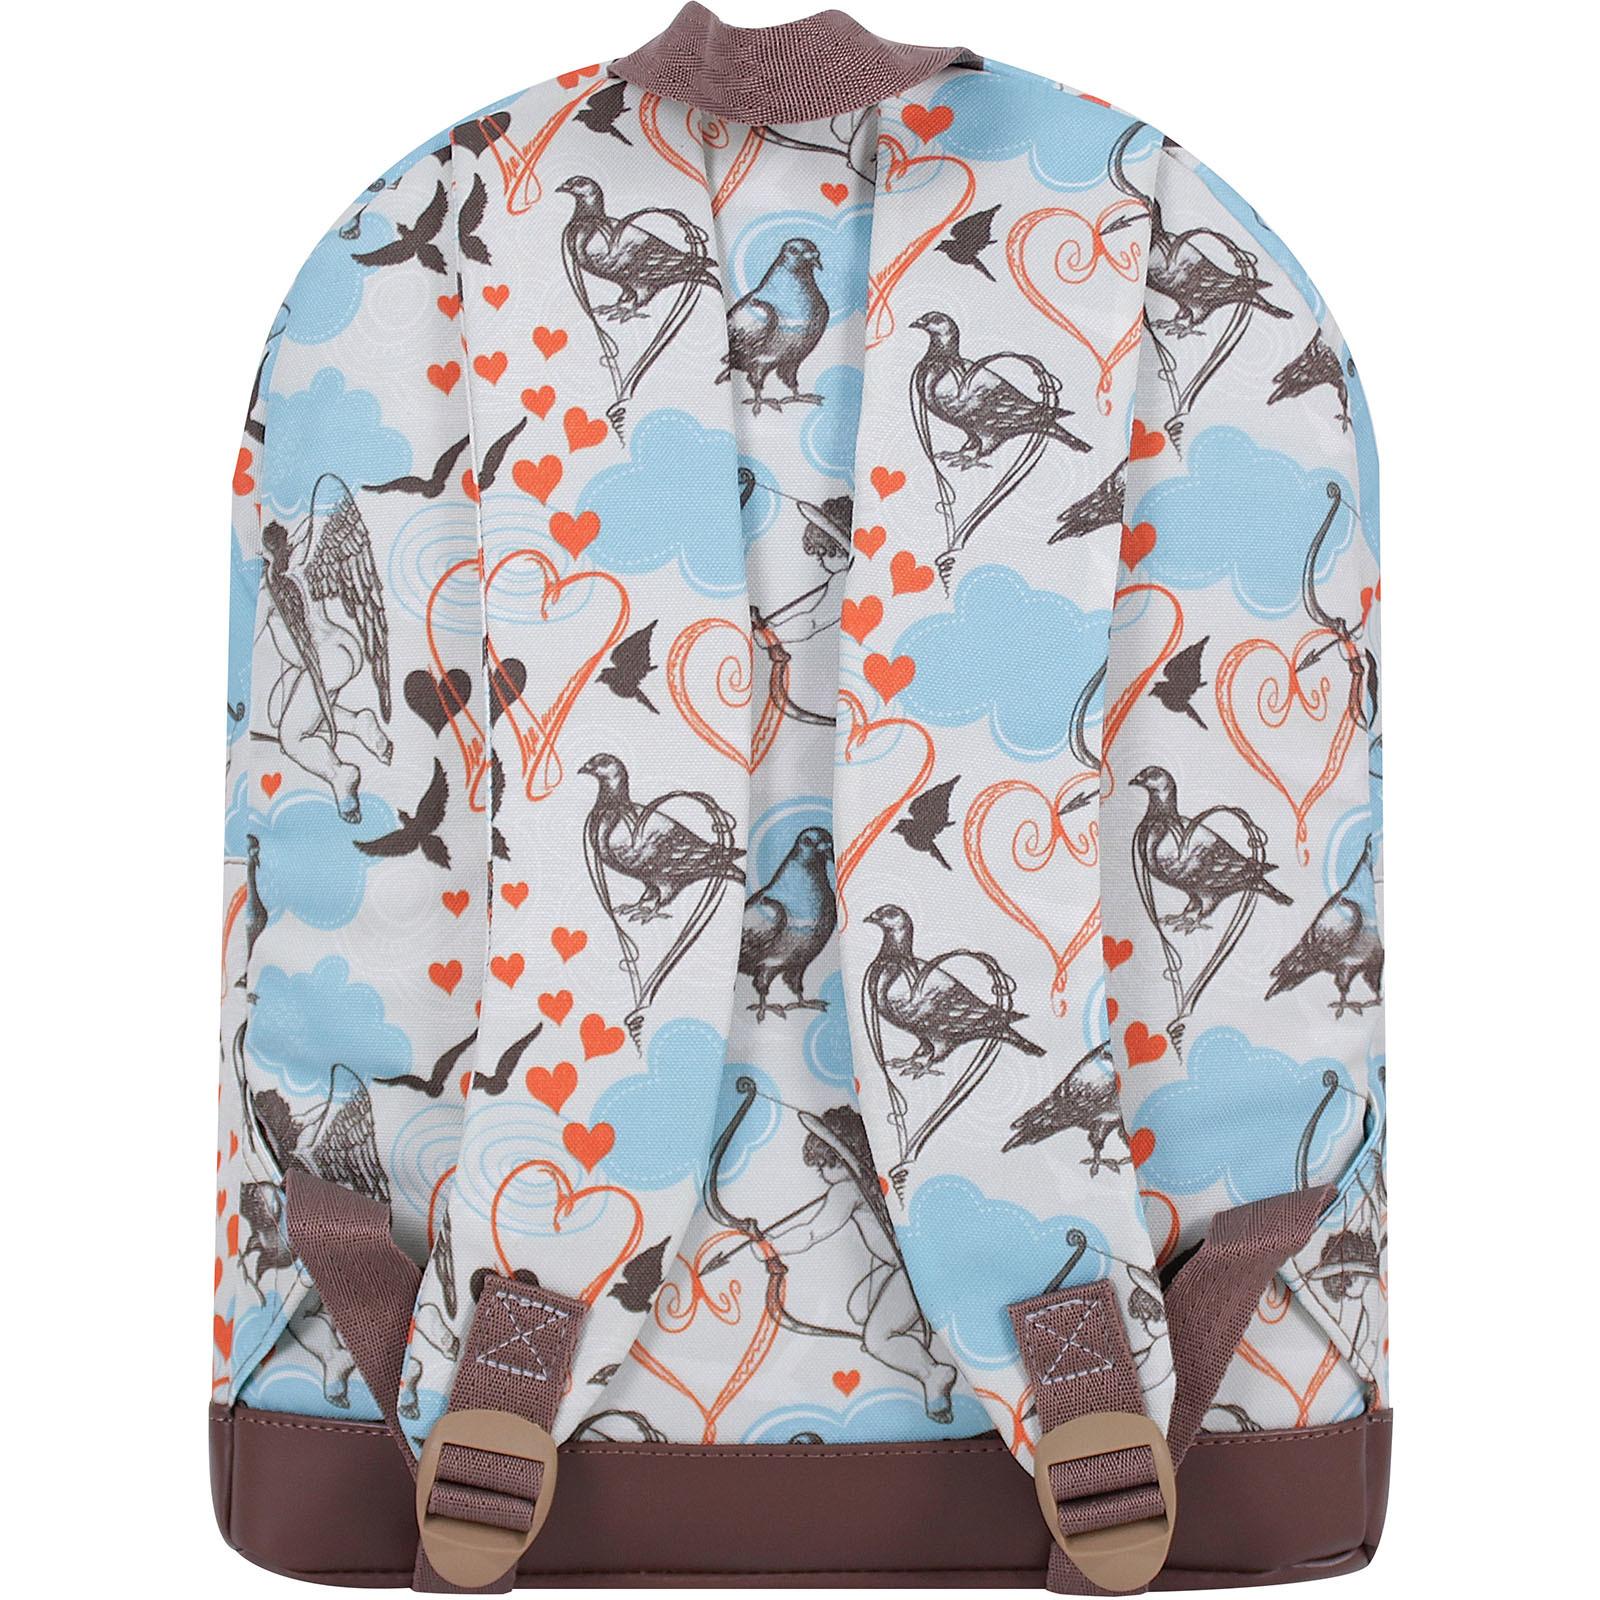 Рюкзак Bagland Молодежный 17 л. сублимация (голуби) (005336640)